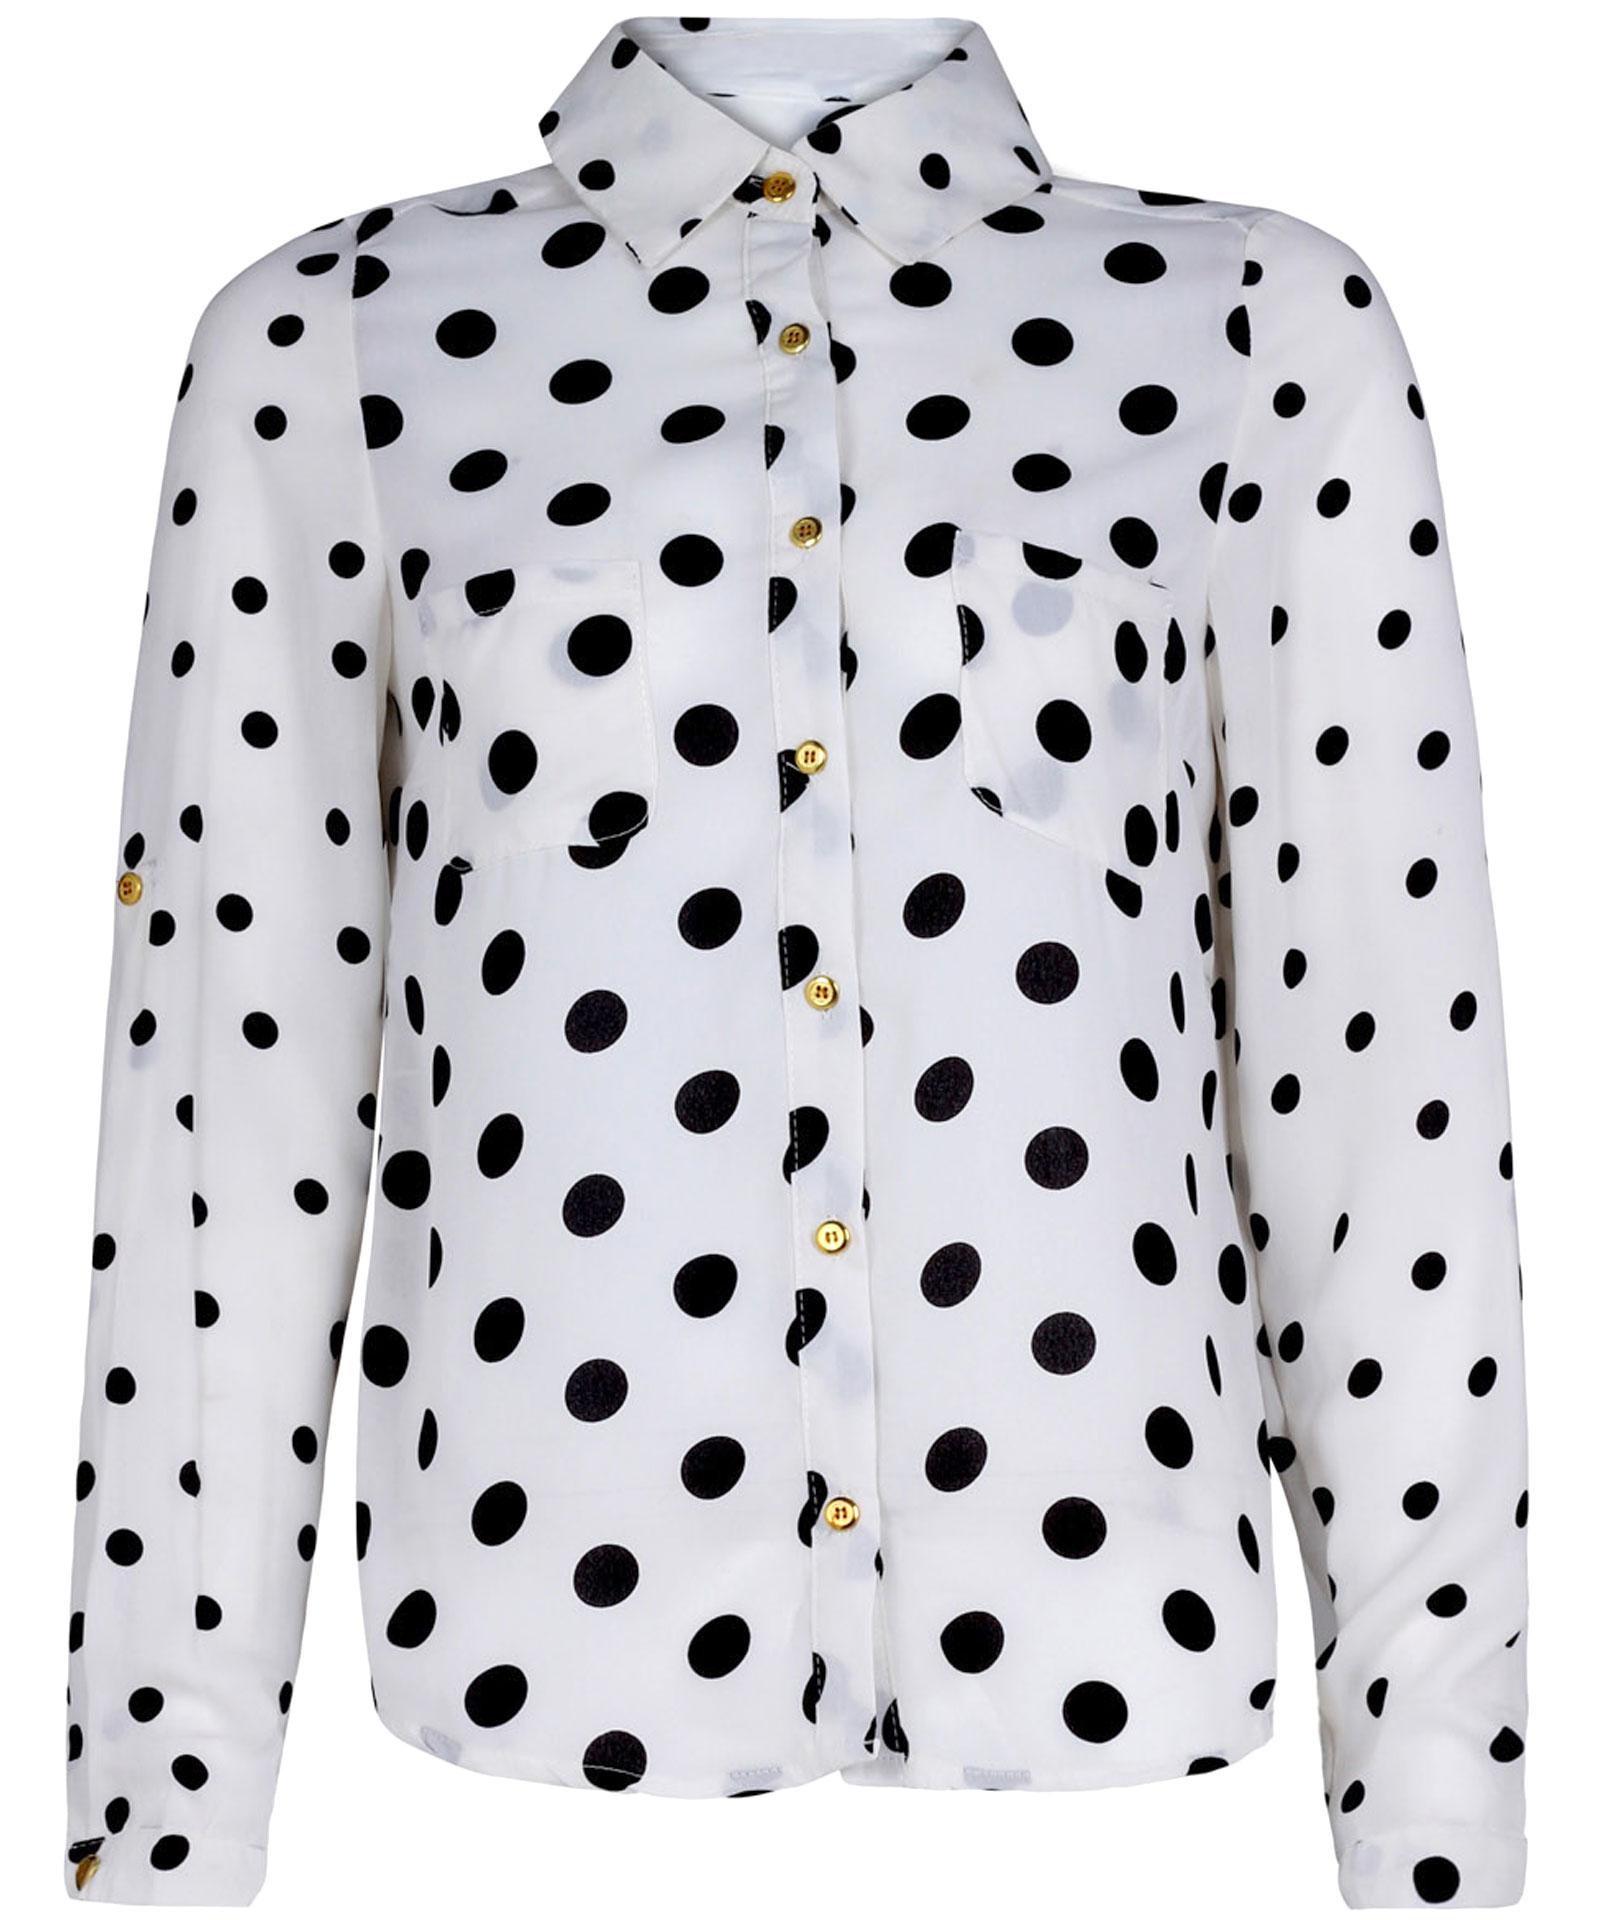 View Item Polkadot Print Chiffon Shirt